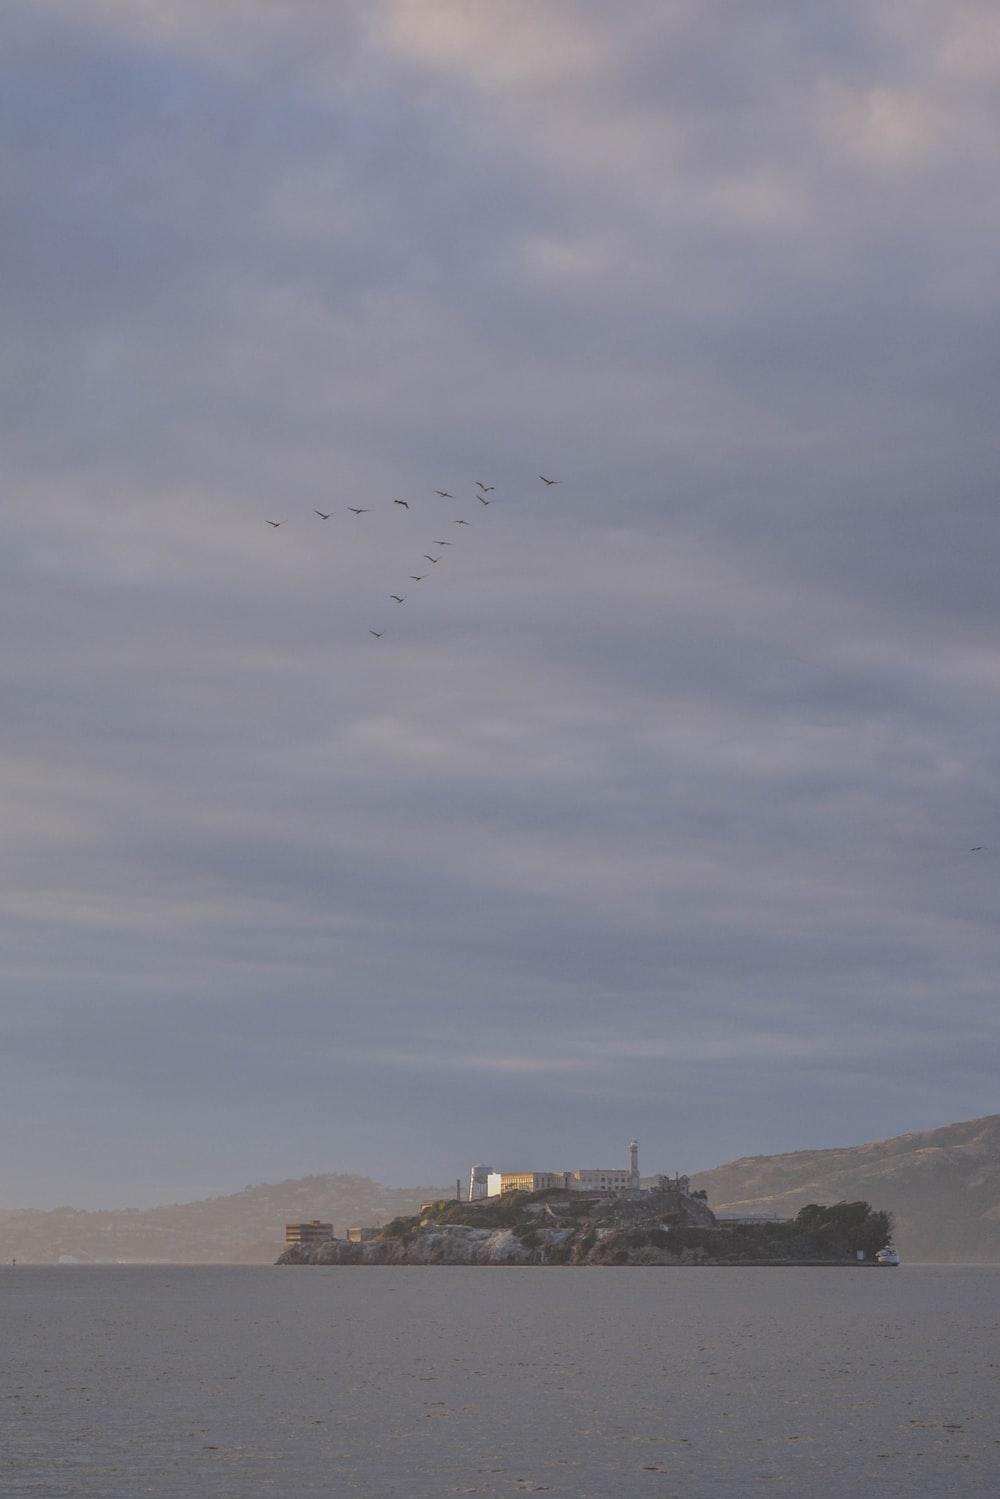 birds flying on v formation over Alcatraz